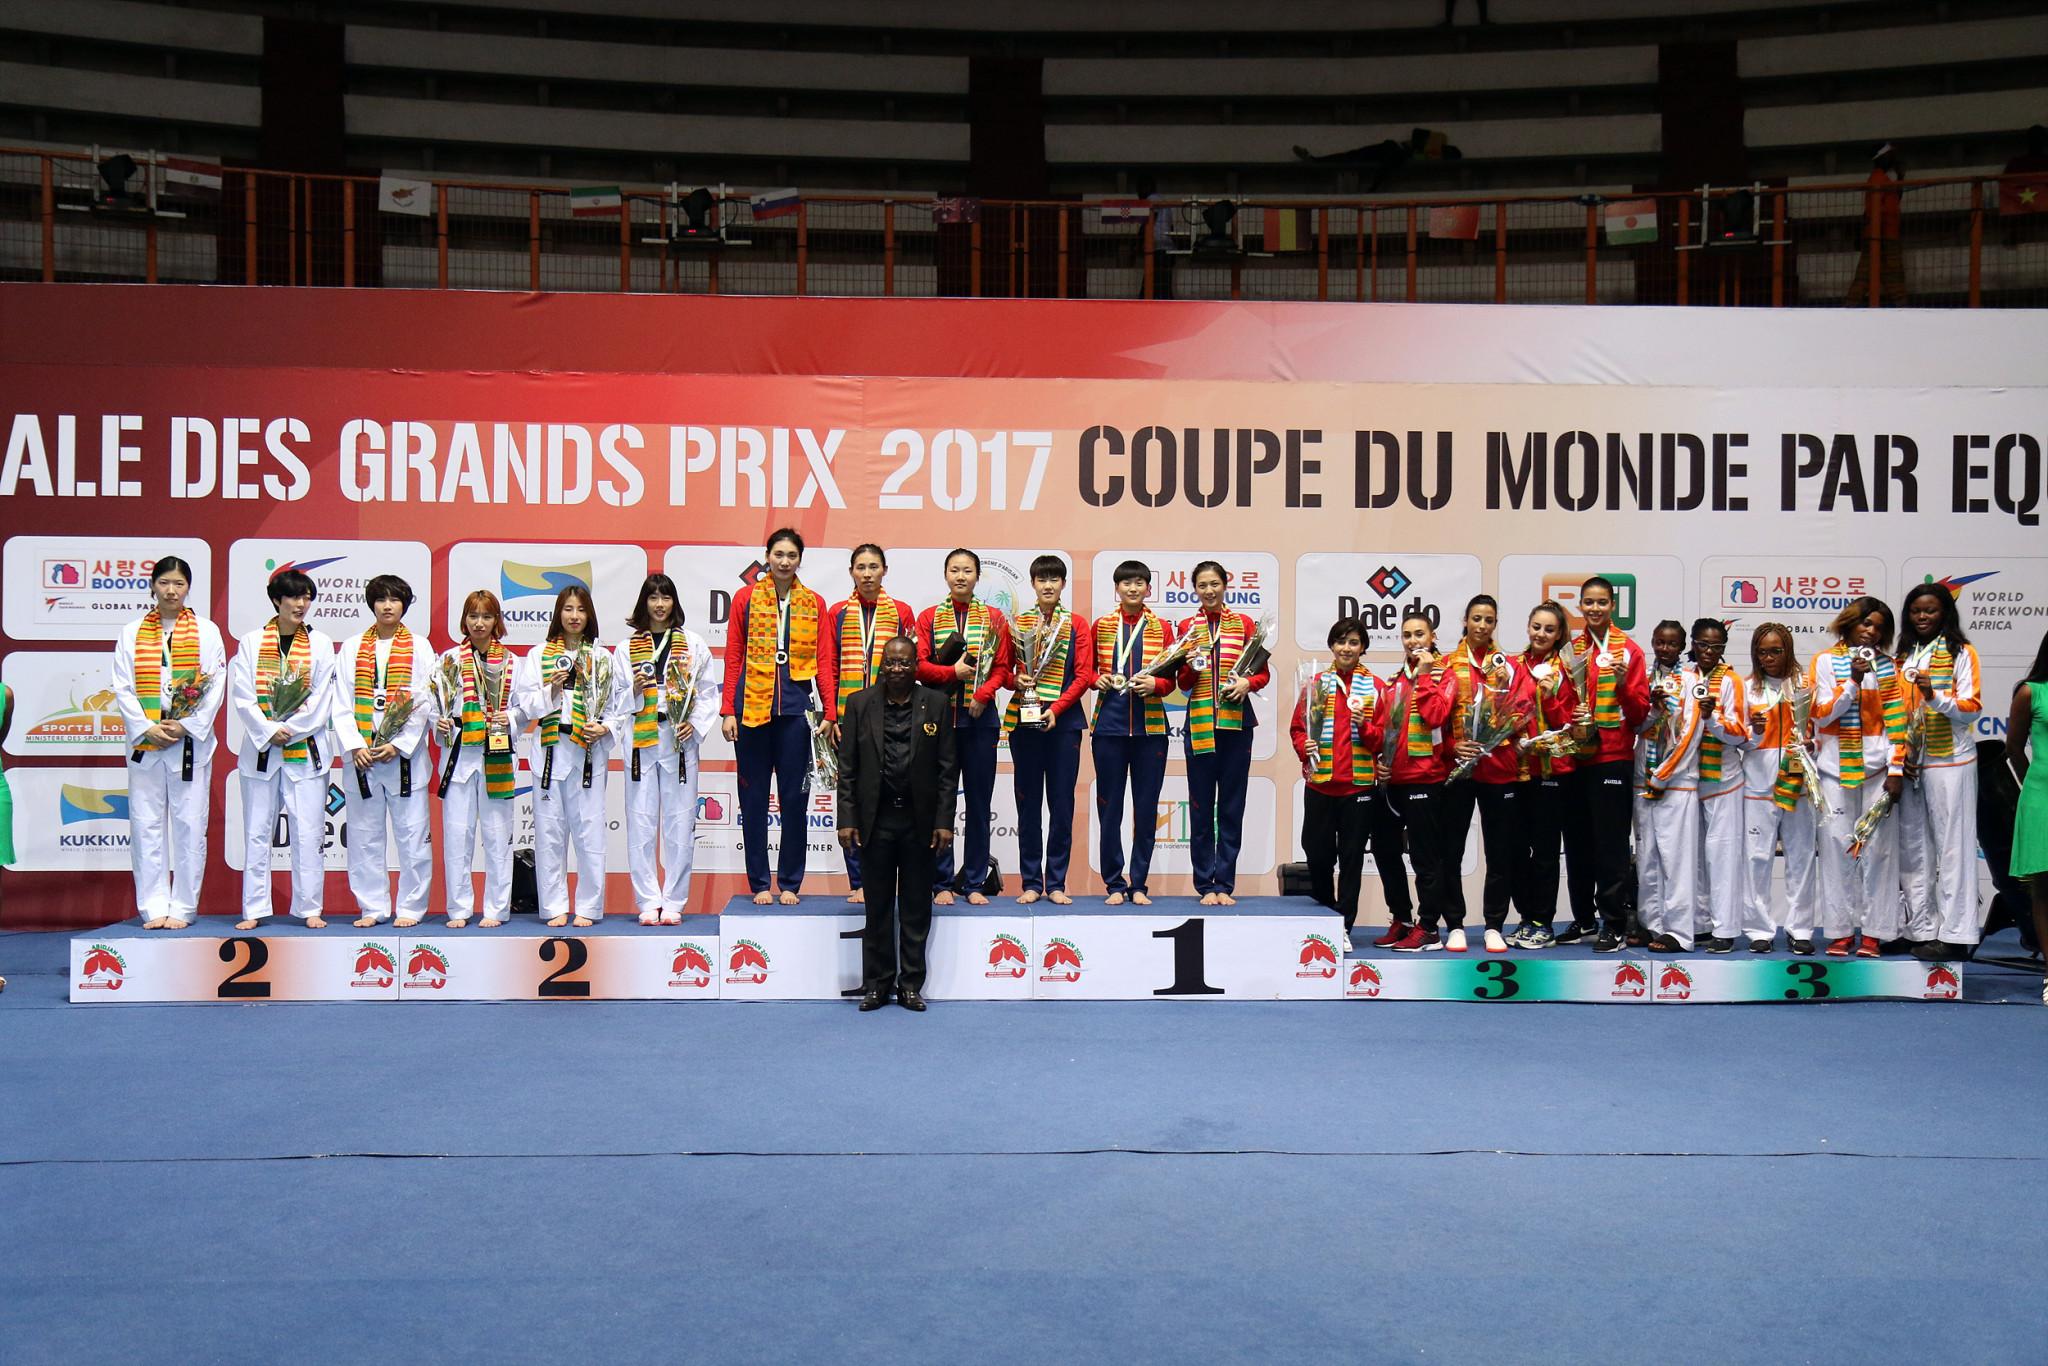 China clinch two titles at World Taekwondo Team Championships